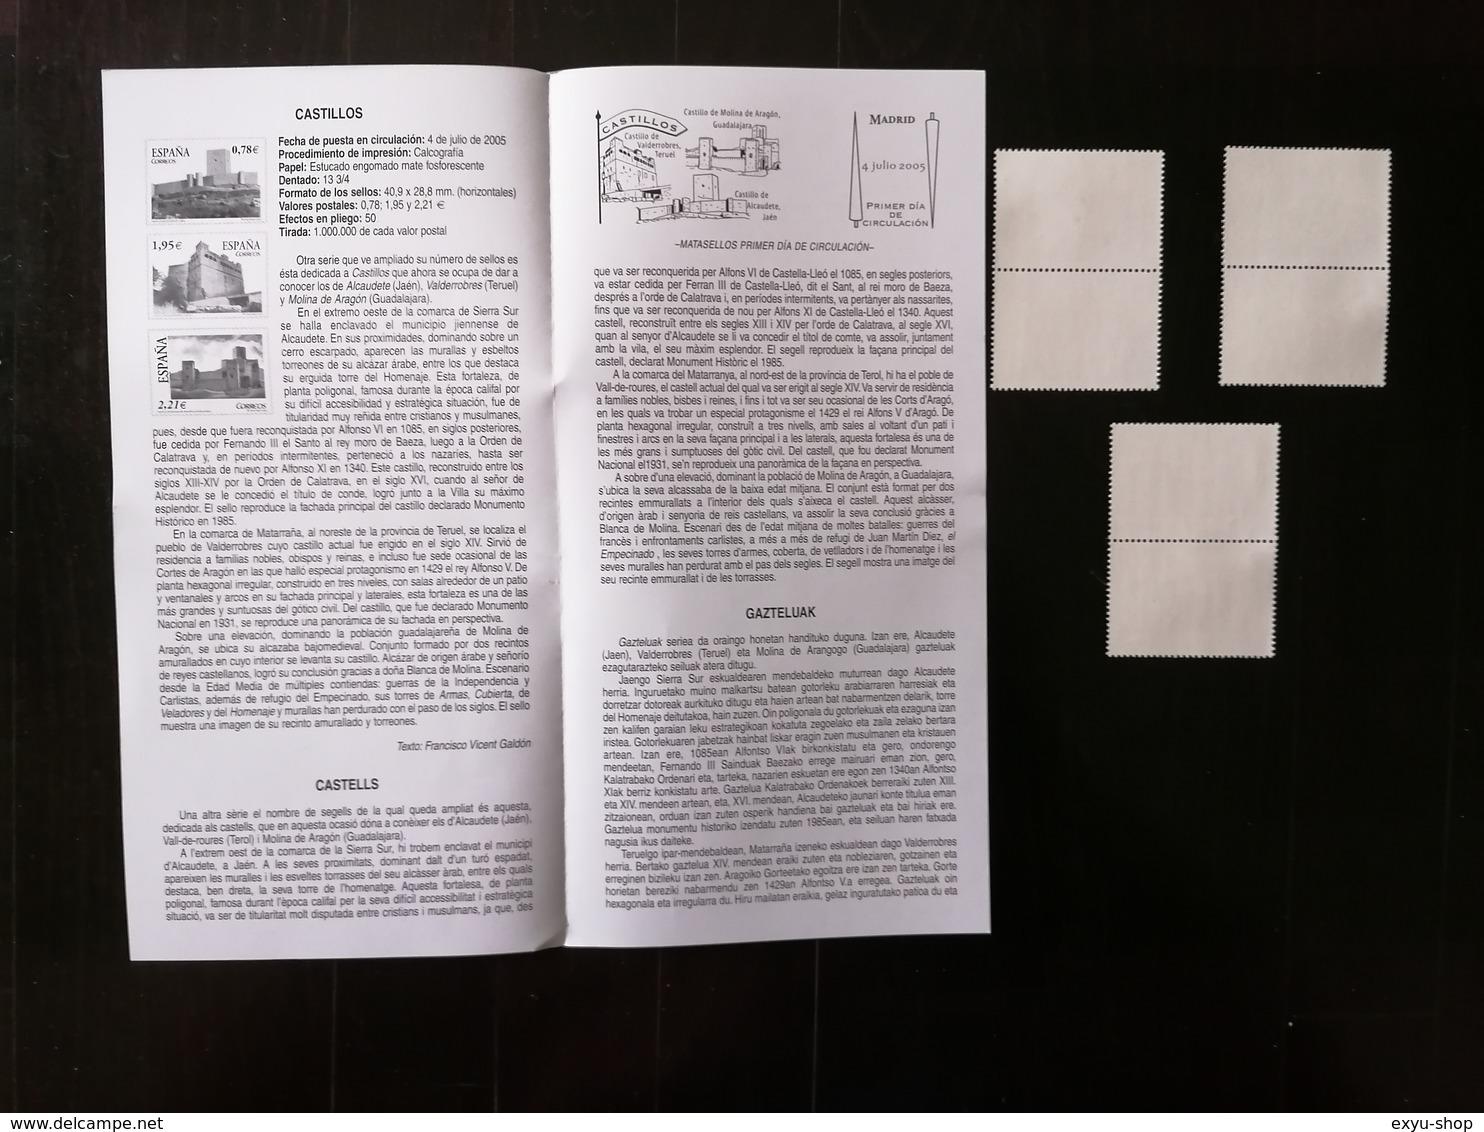 SPAIN 2005 - CASTILLOS - CASTLES - 2001-10 Unused Stamps